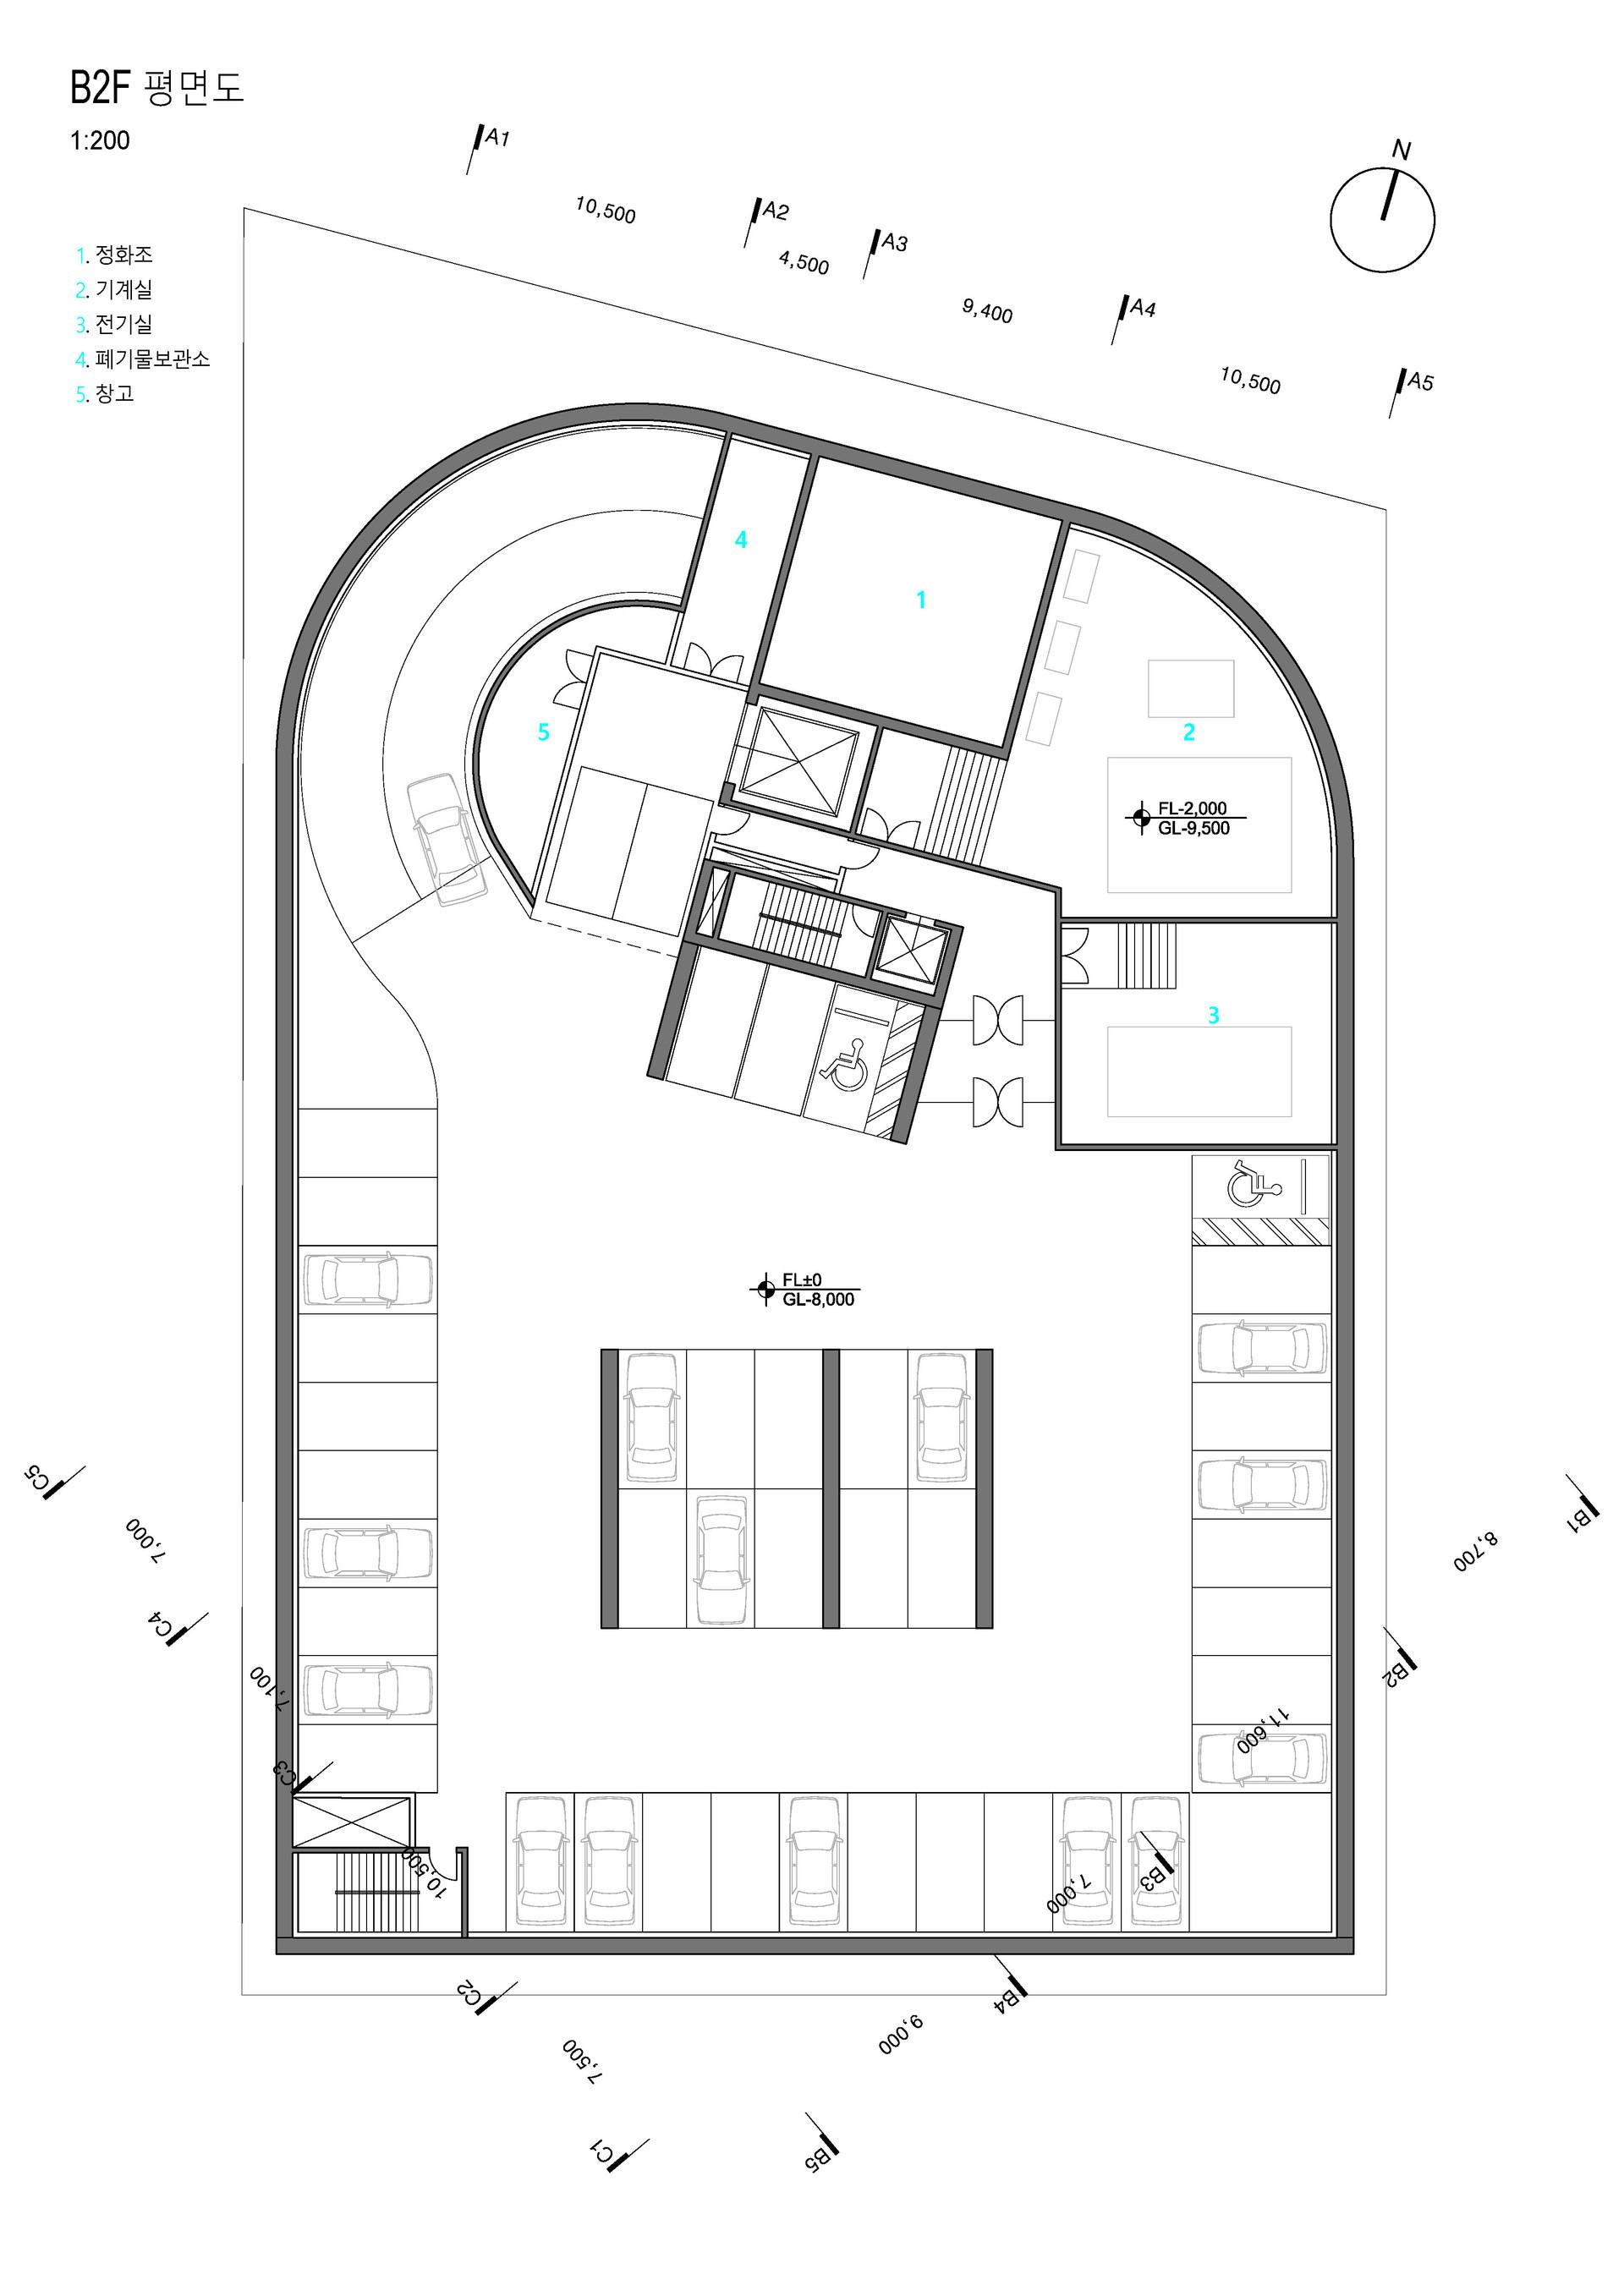 Plan_B2F [GM-08163].jpg